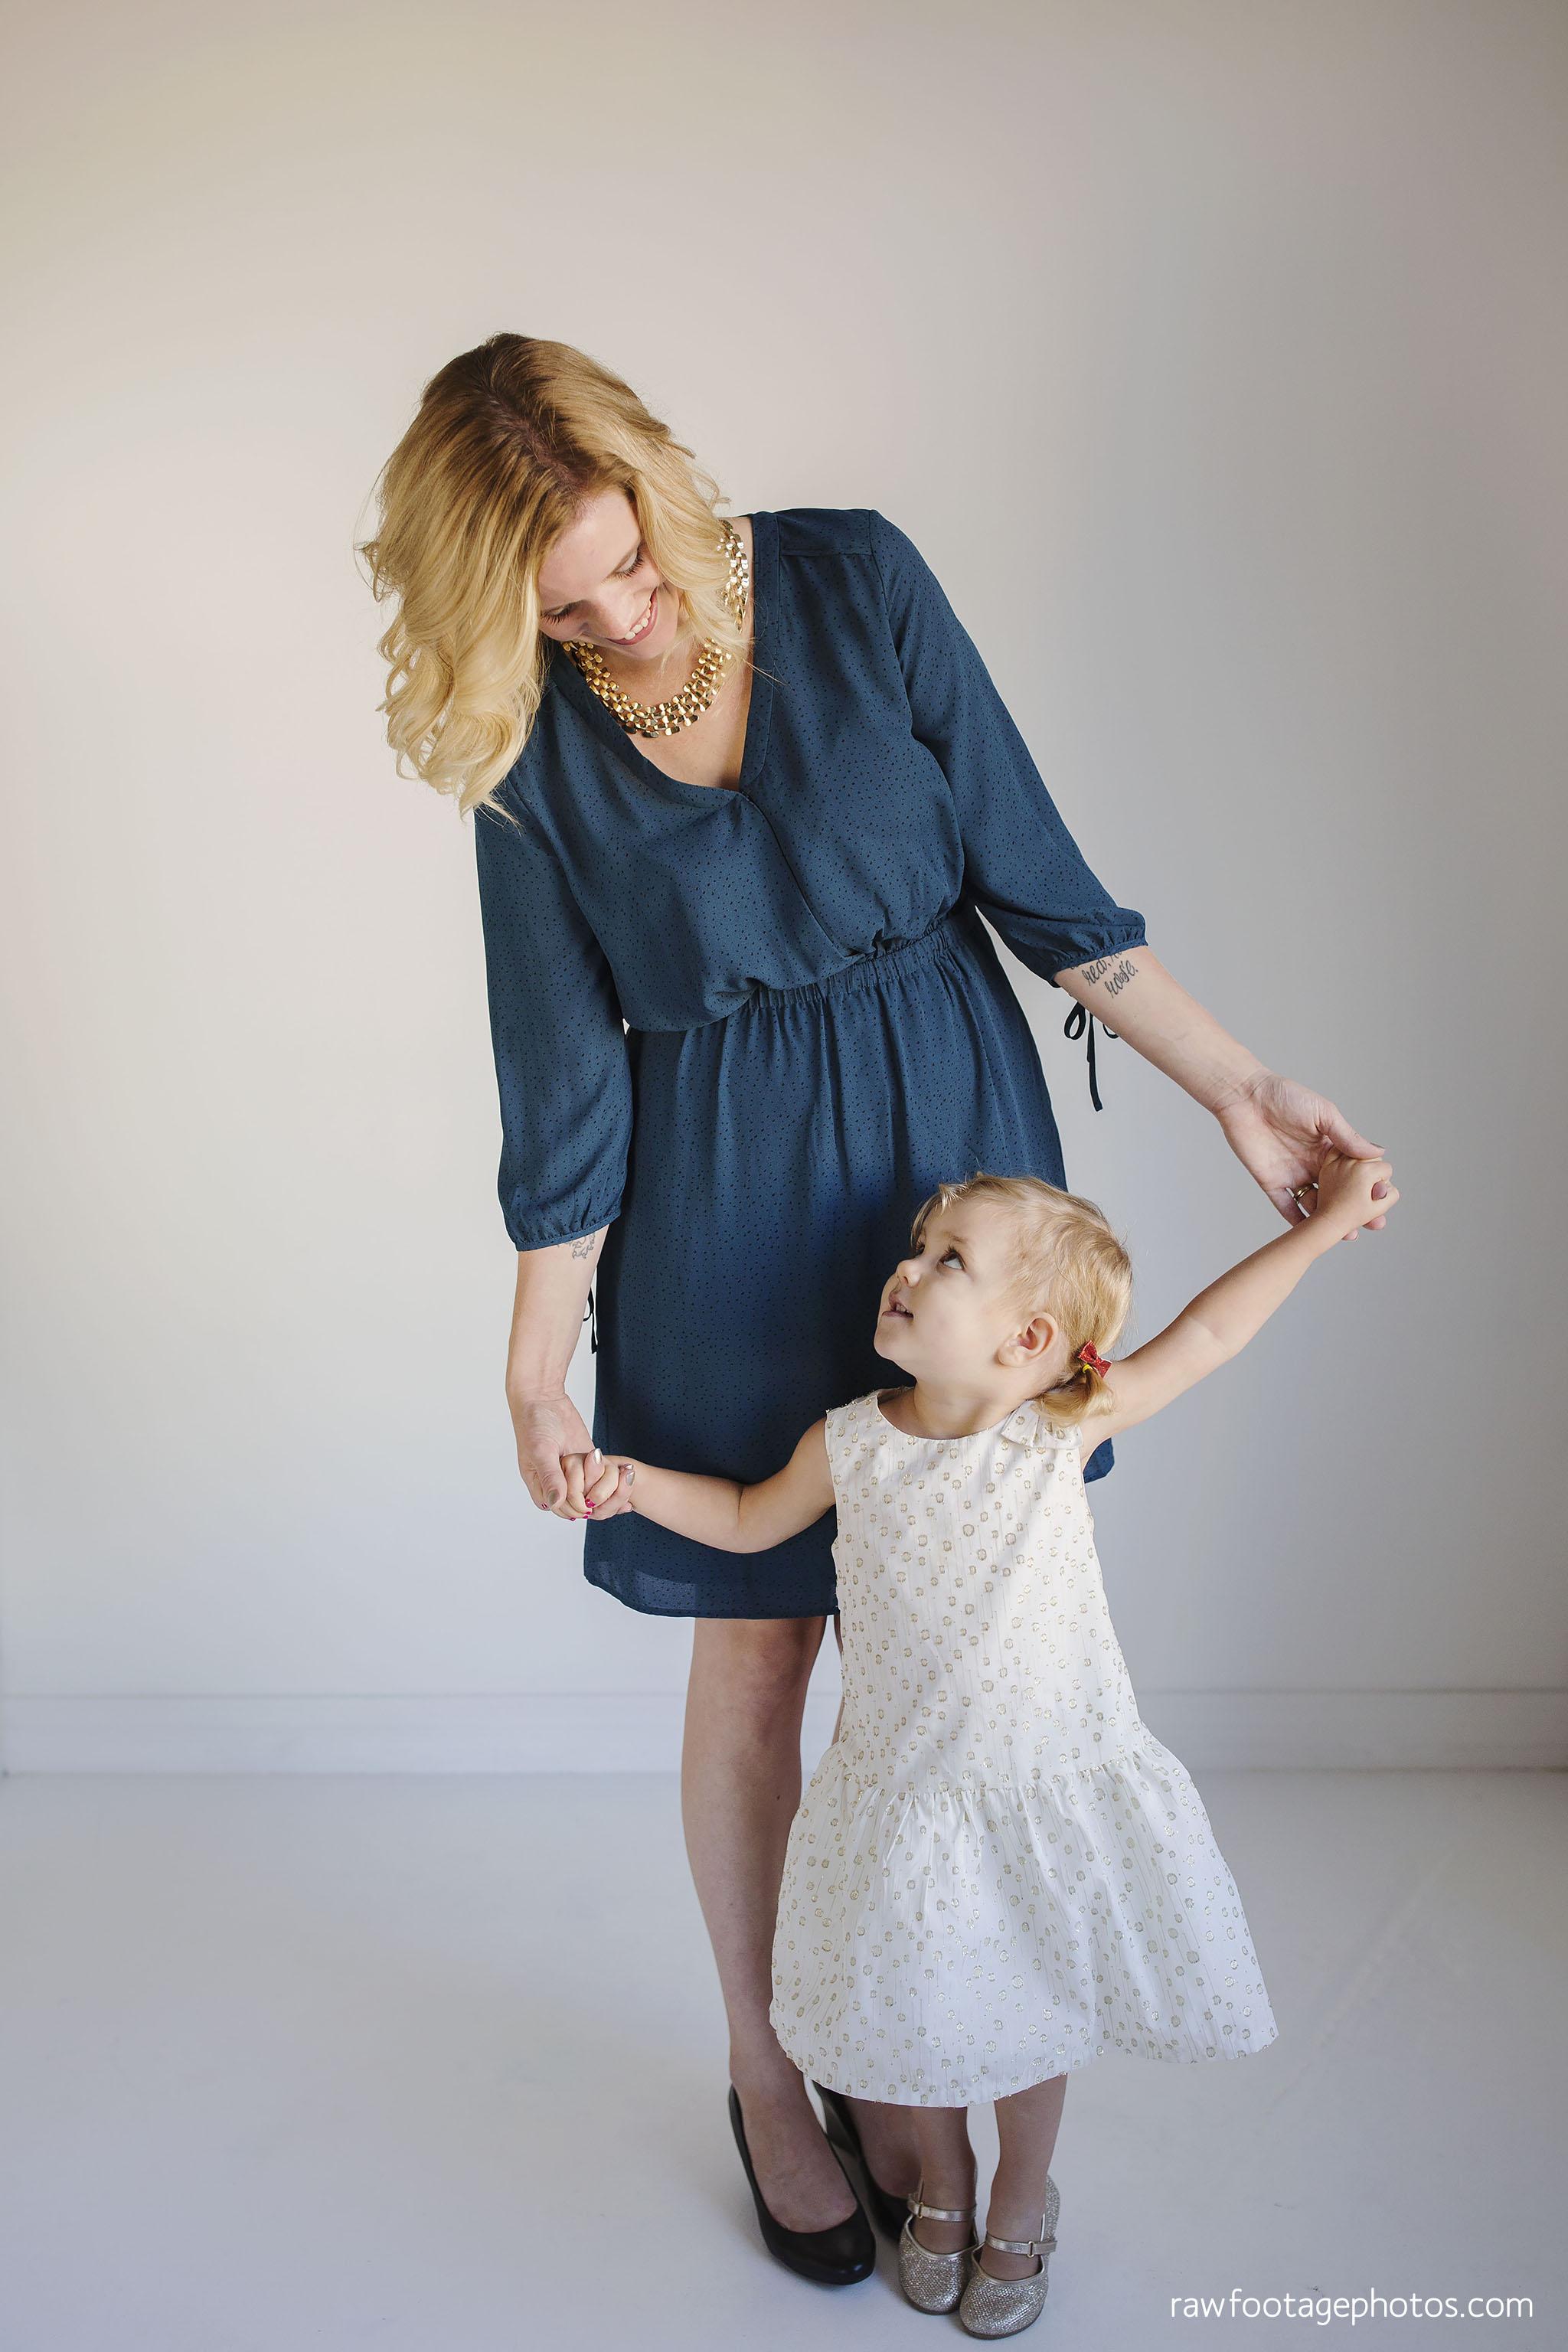 london_ontario_family_photographer-studio_photography-studio_lifestyle_portraits-white_studio-mother_son-candid_family_photography-raw_footage_photography040.jpg